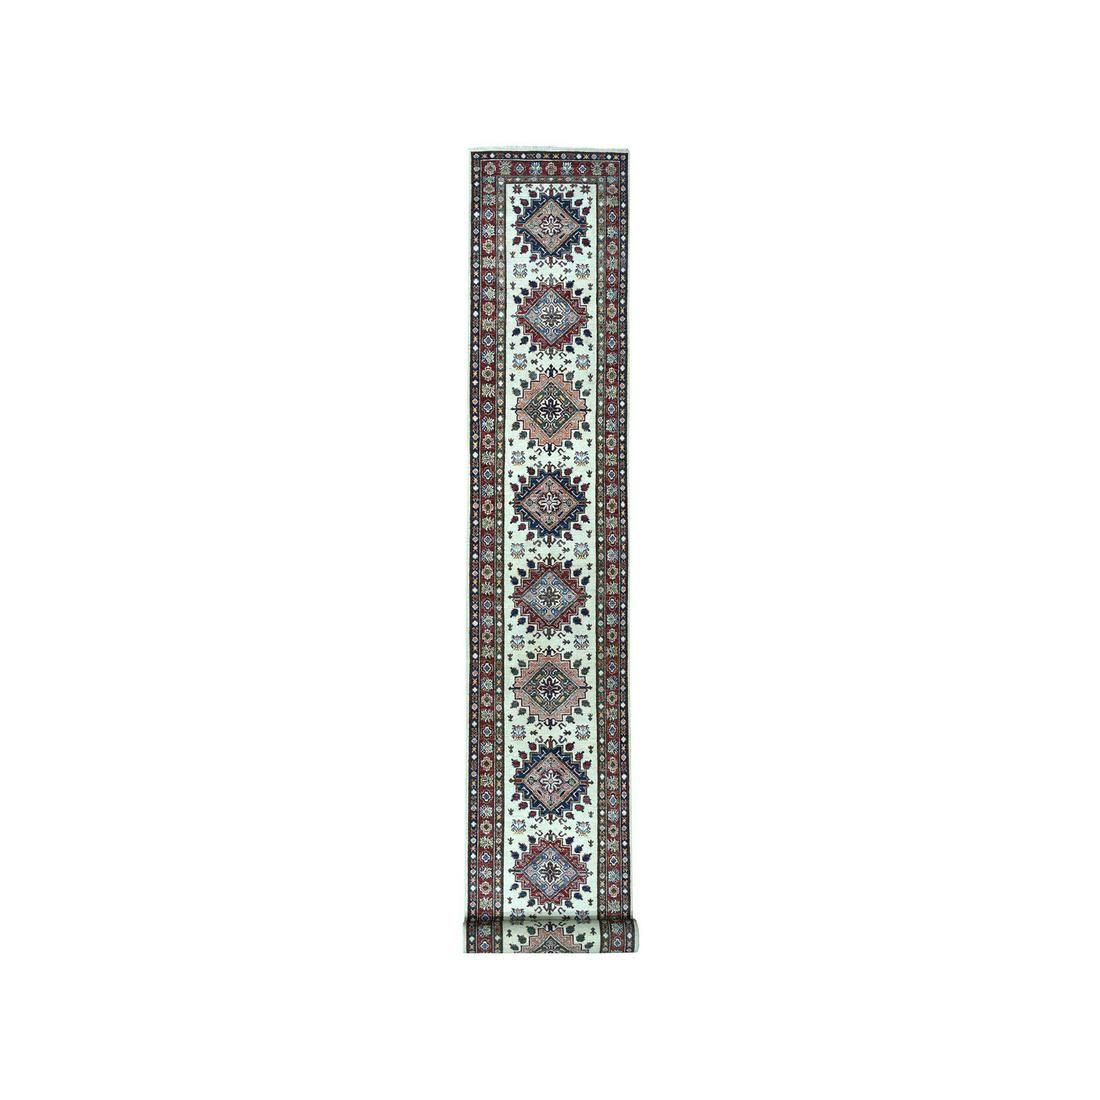 Super Kazak Geometric Design XL Runner Pure Wool